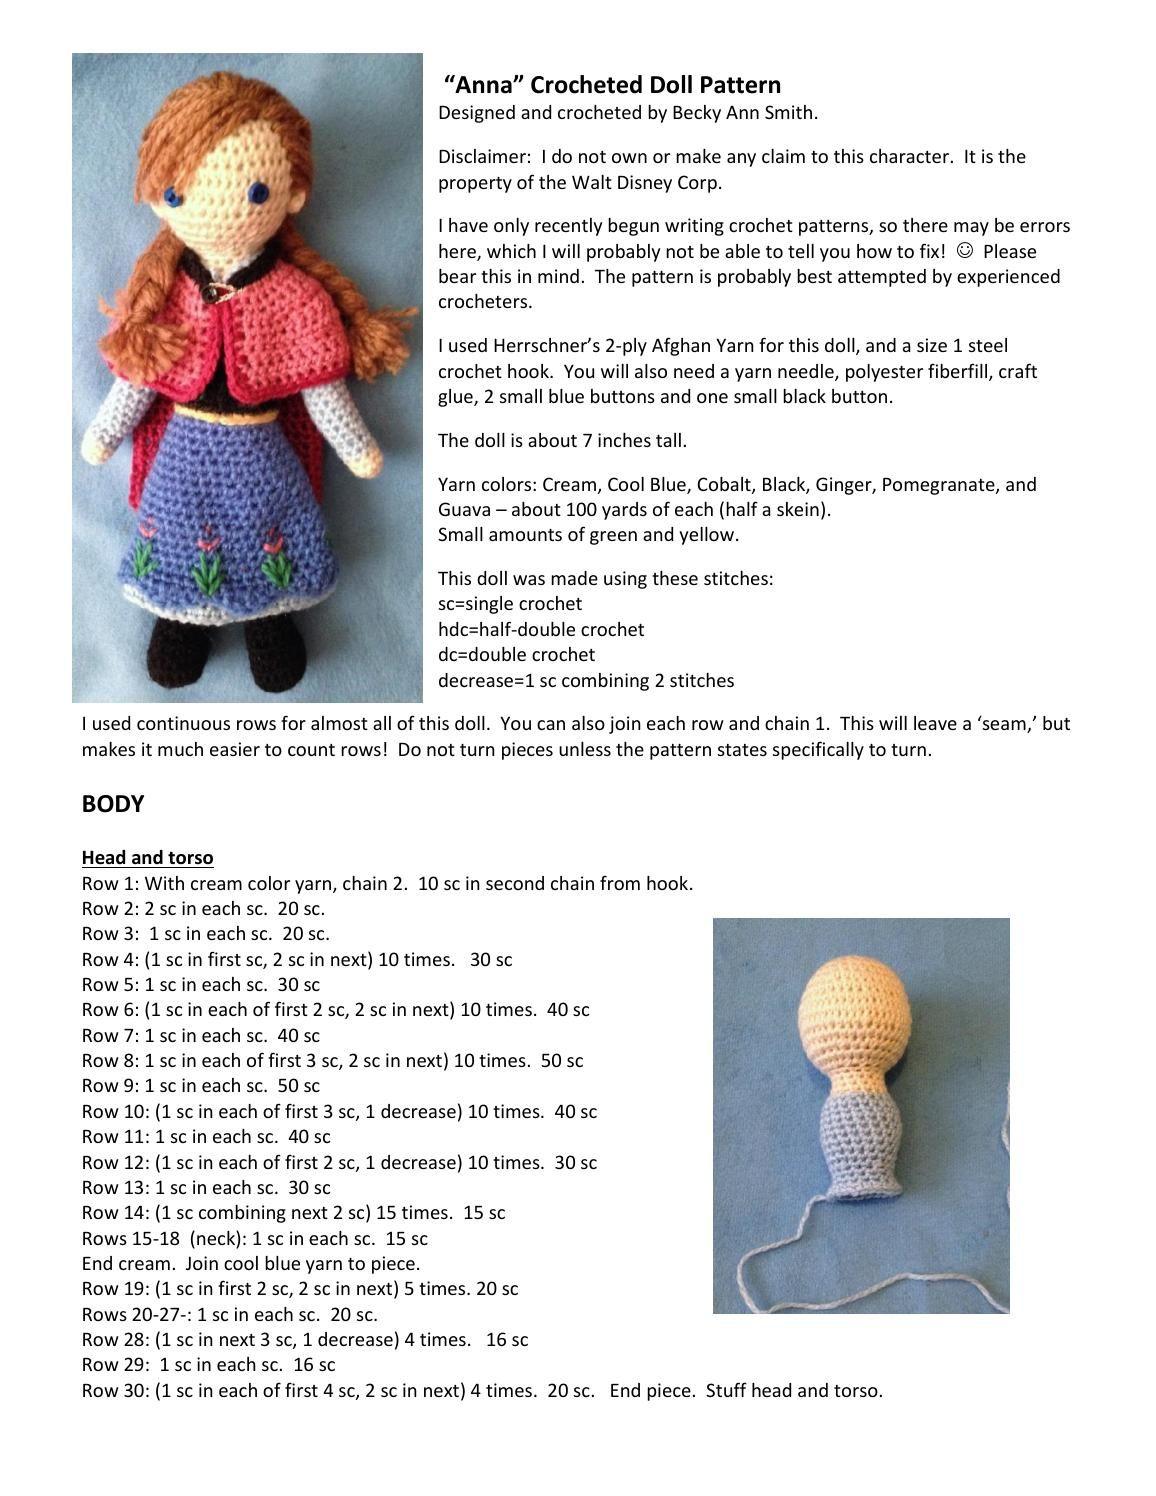 Anna crocheted doll pattern | Crochet doll pattern, Crochet dolls ...